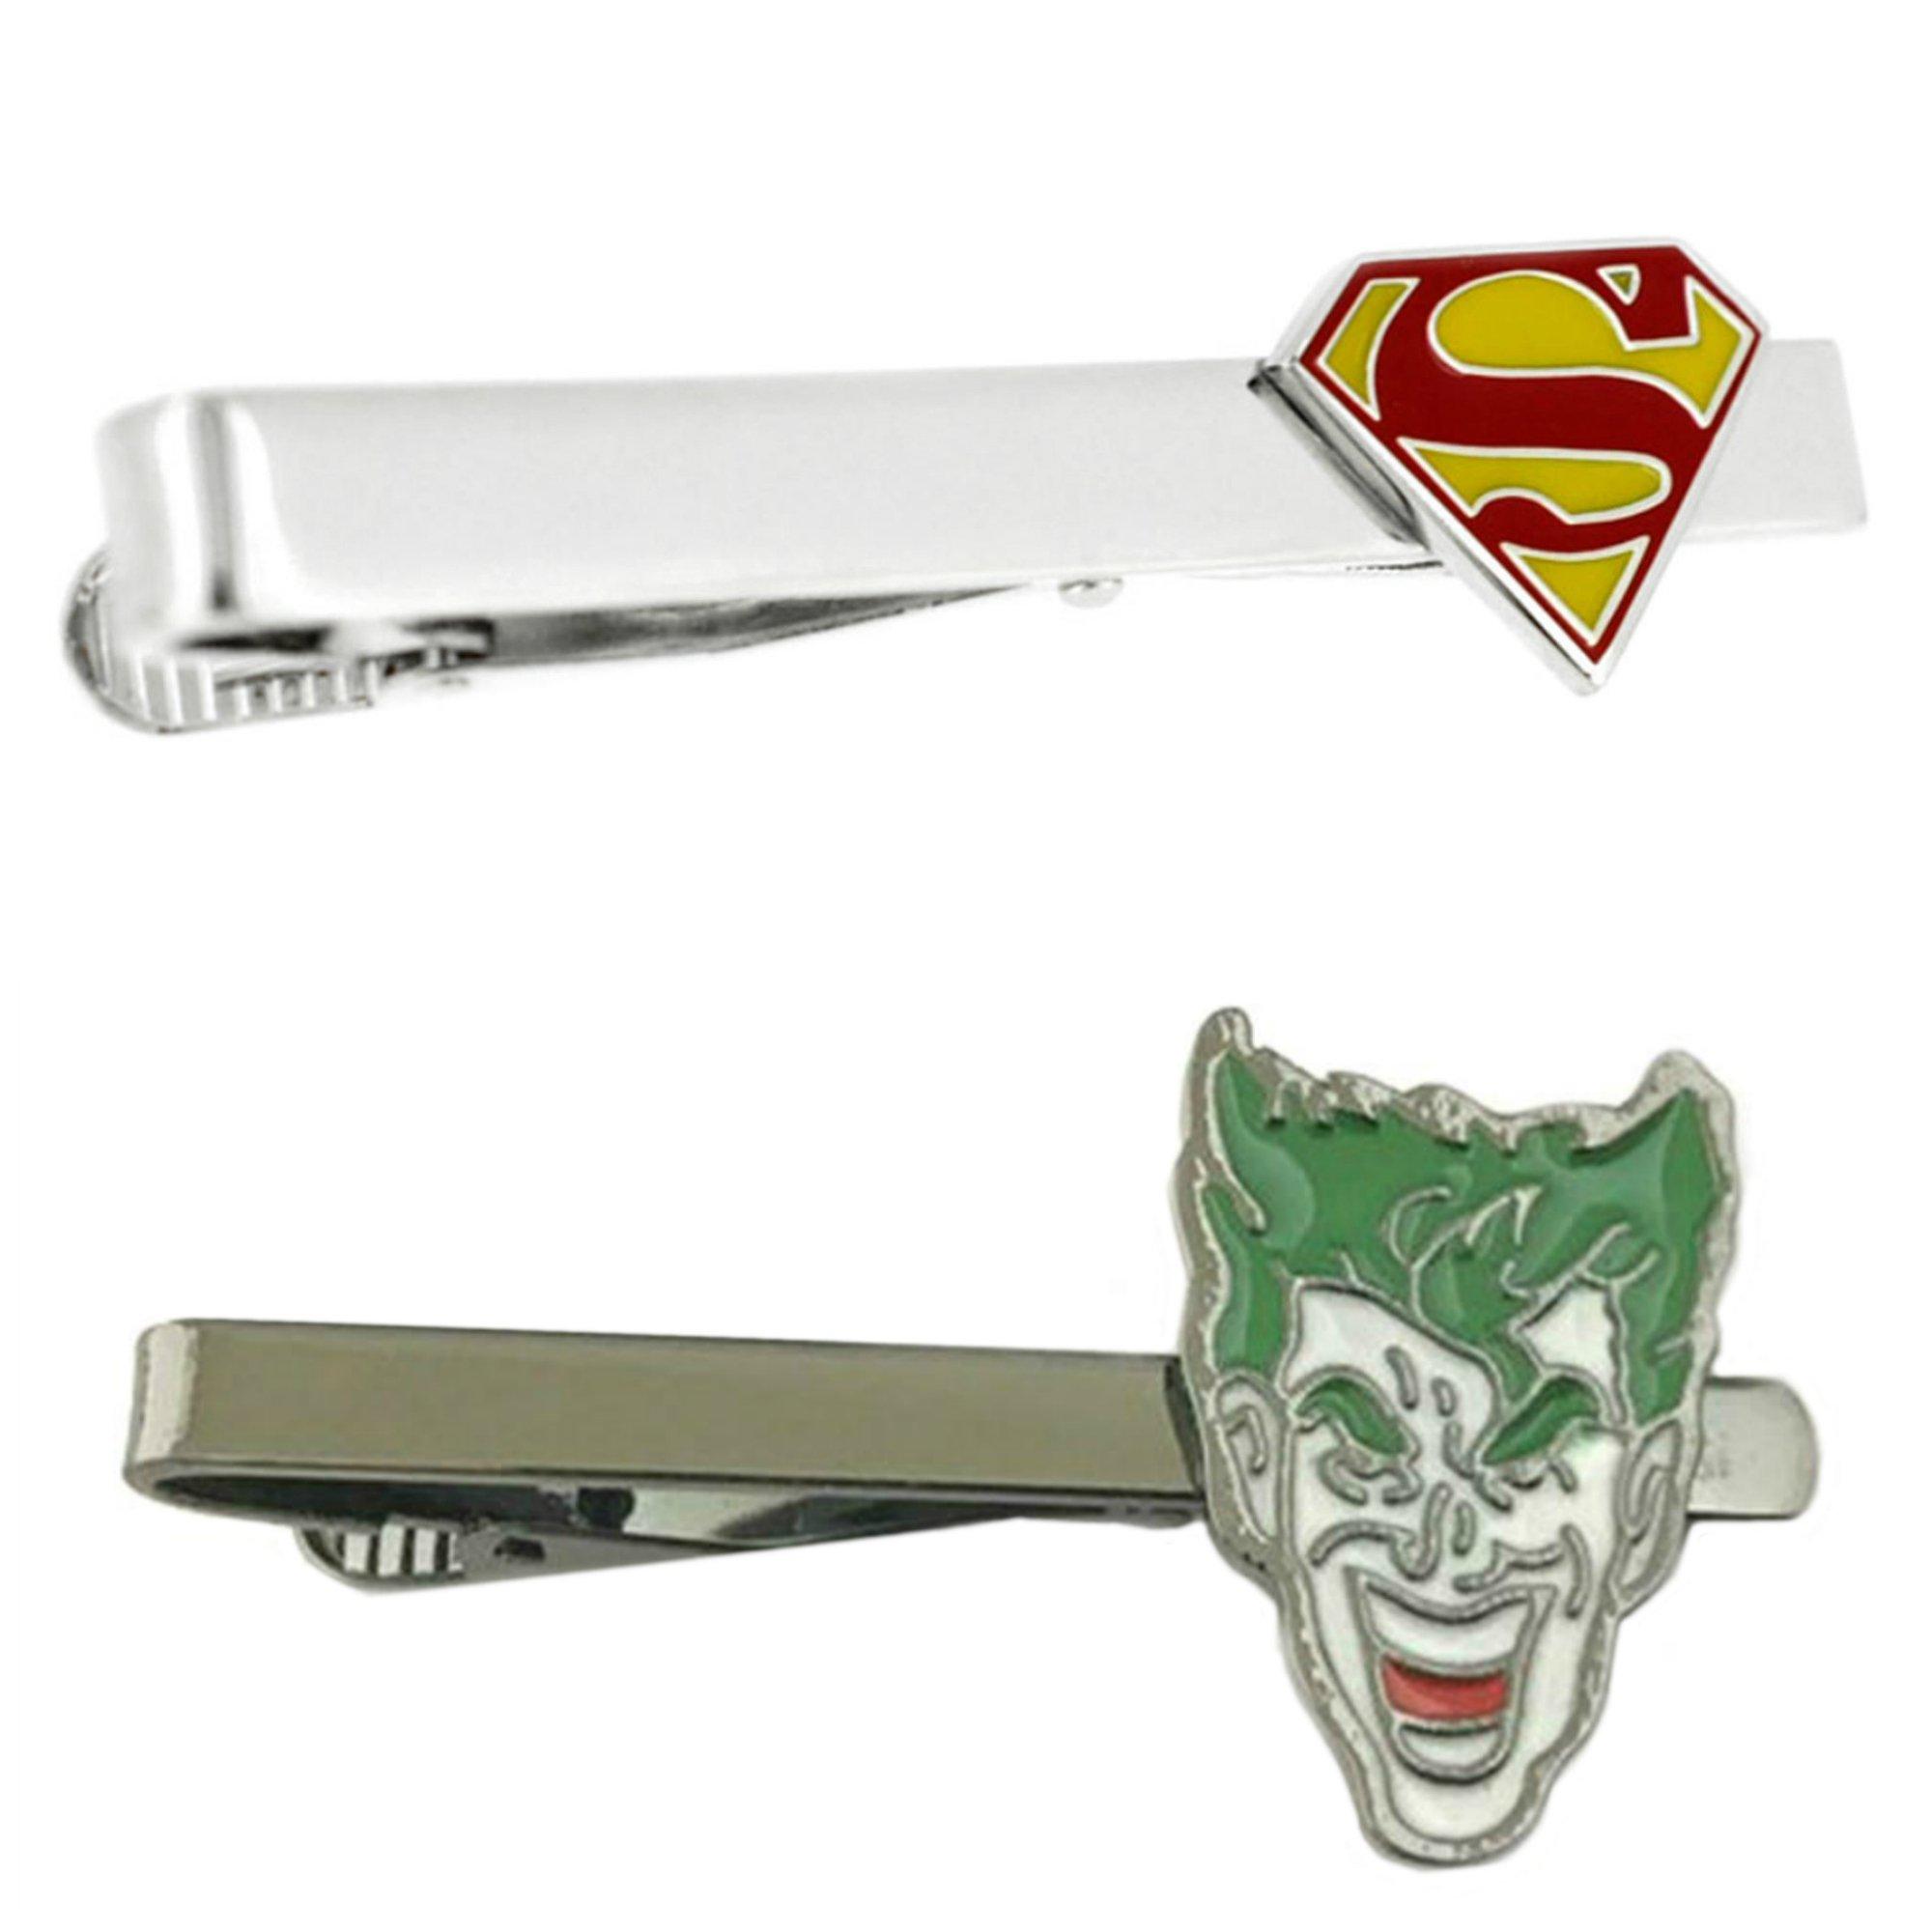 Outlander DC Comics - Superman & Joker - Tiebar Tie Clasp Set of 2 Wedding Superhero Logo w/Gift Box